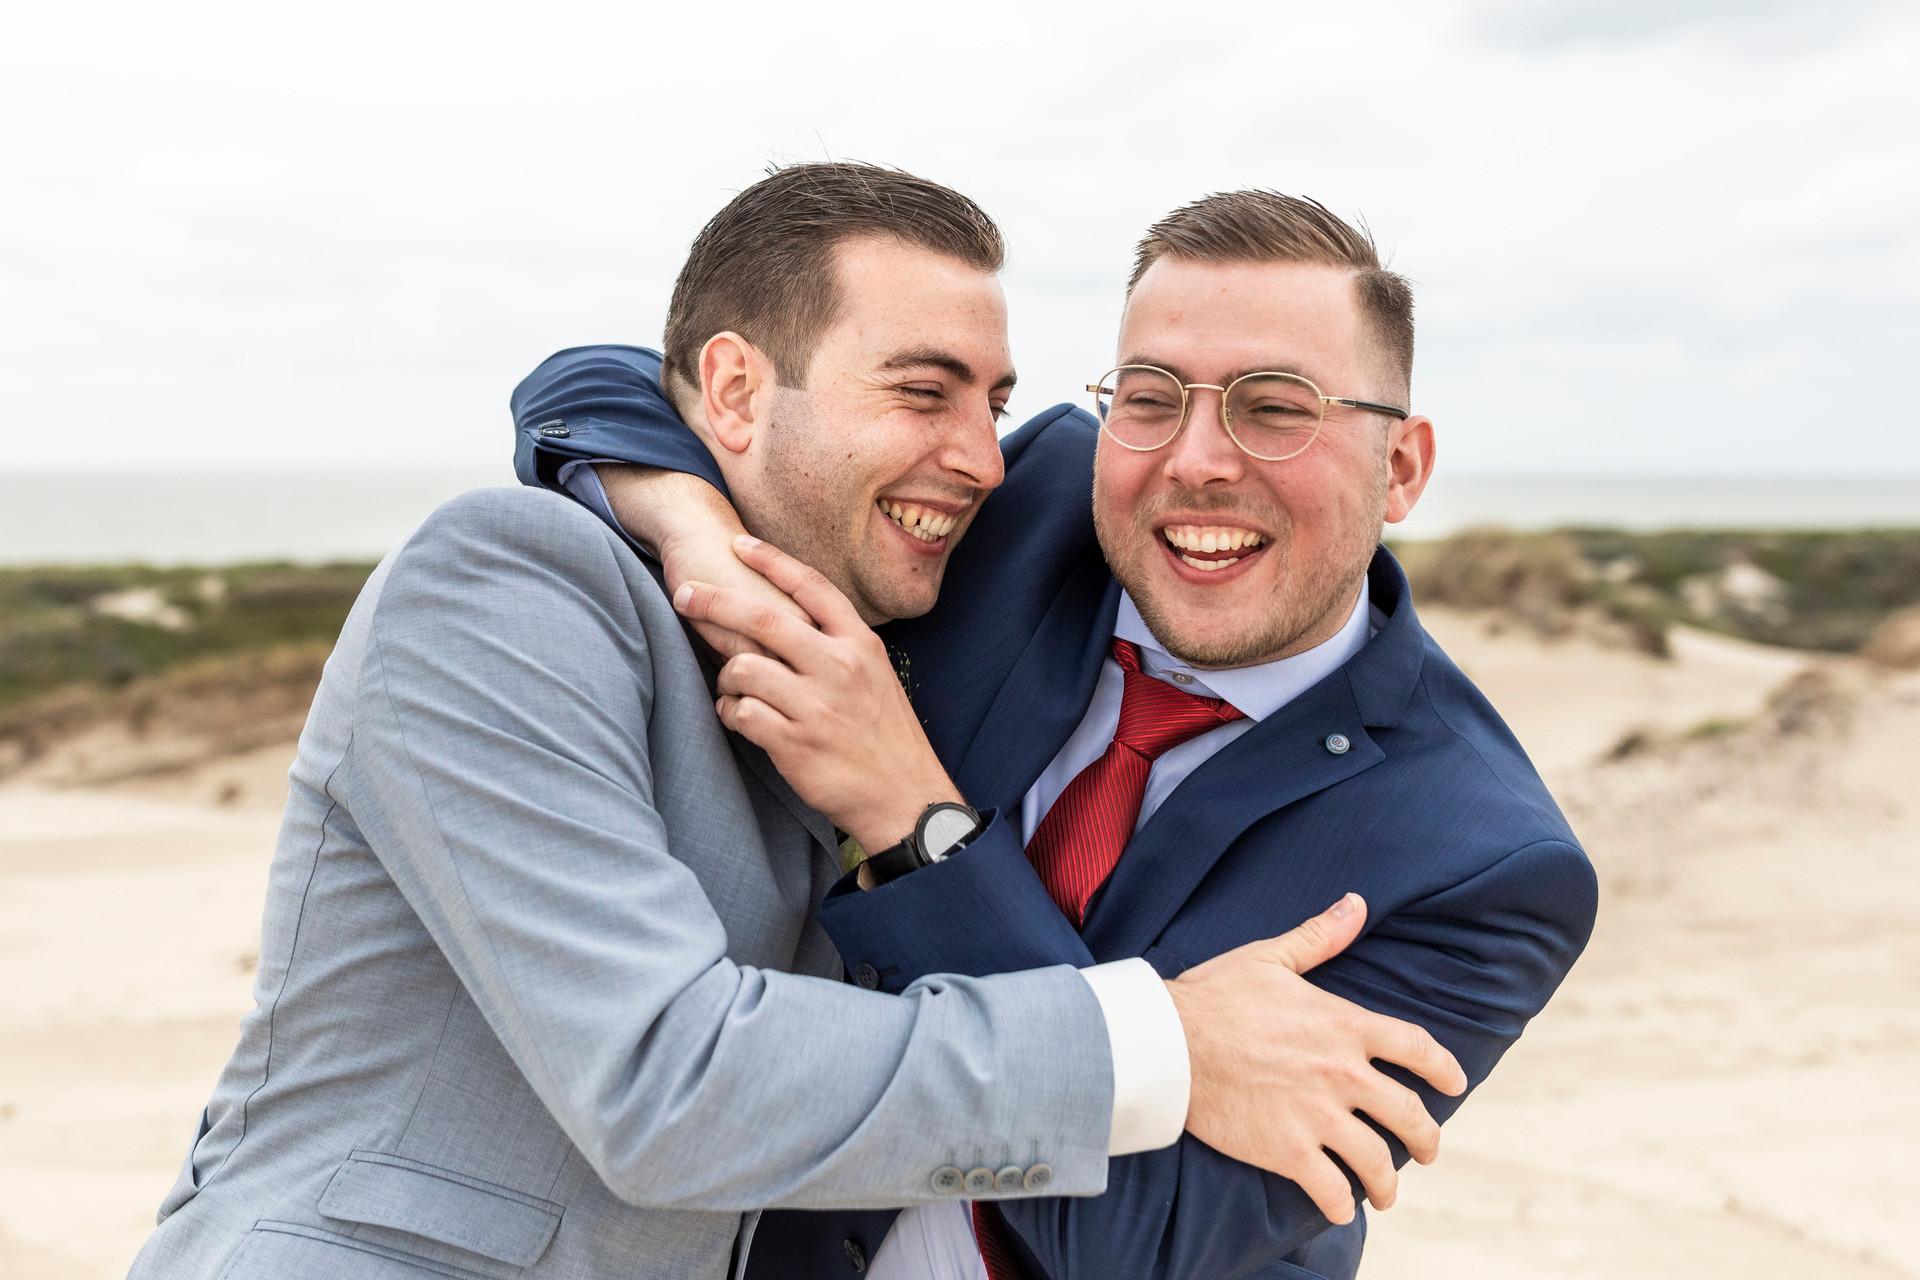 Bruiloft foto stoute broers